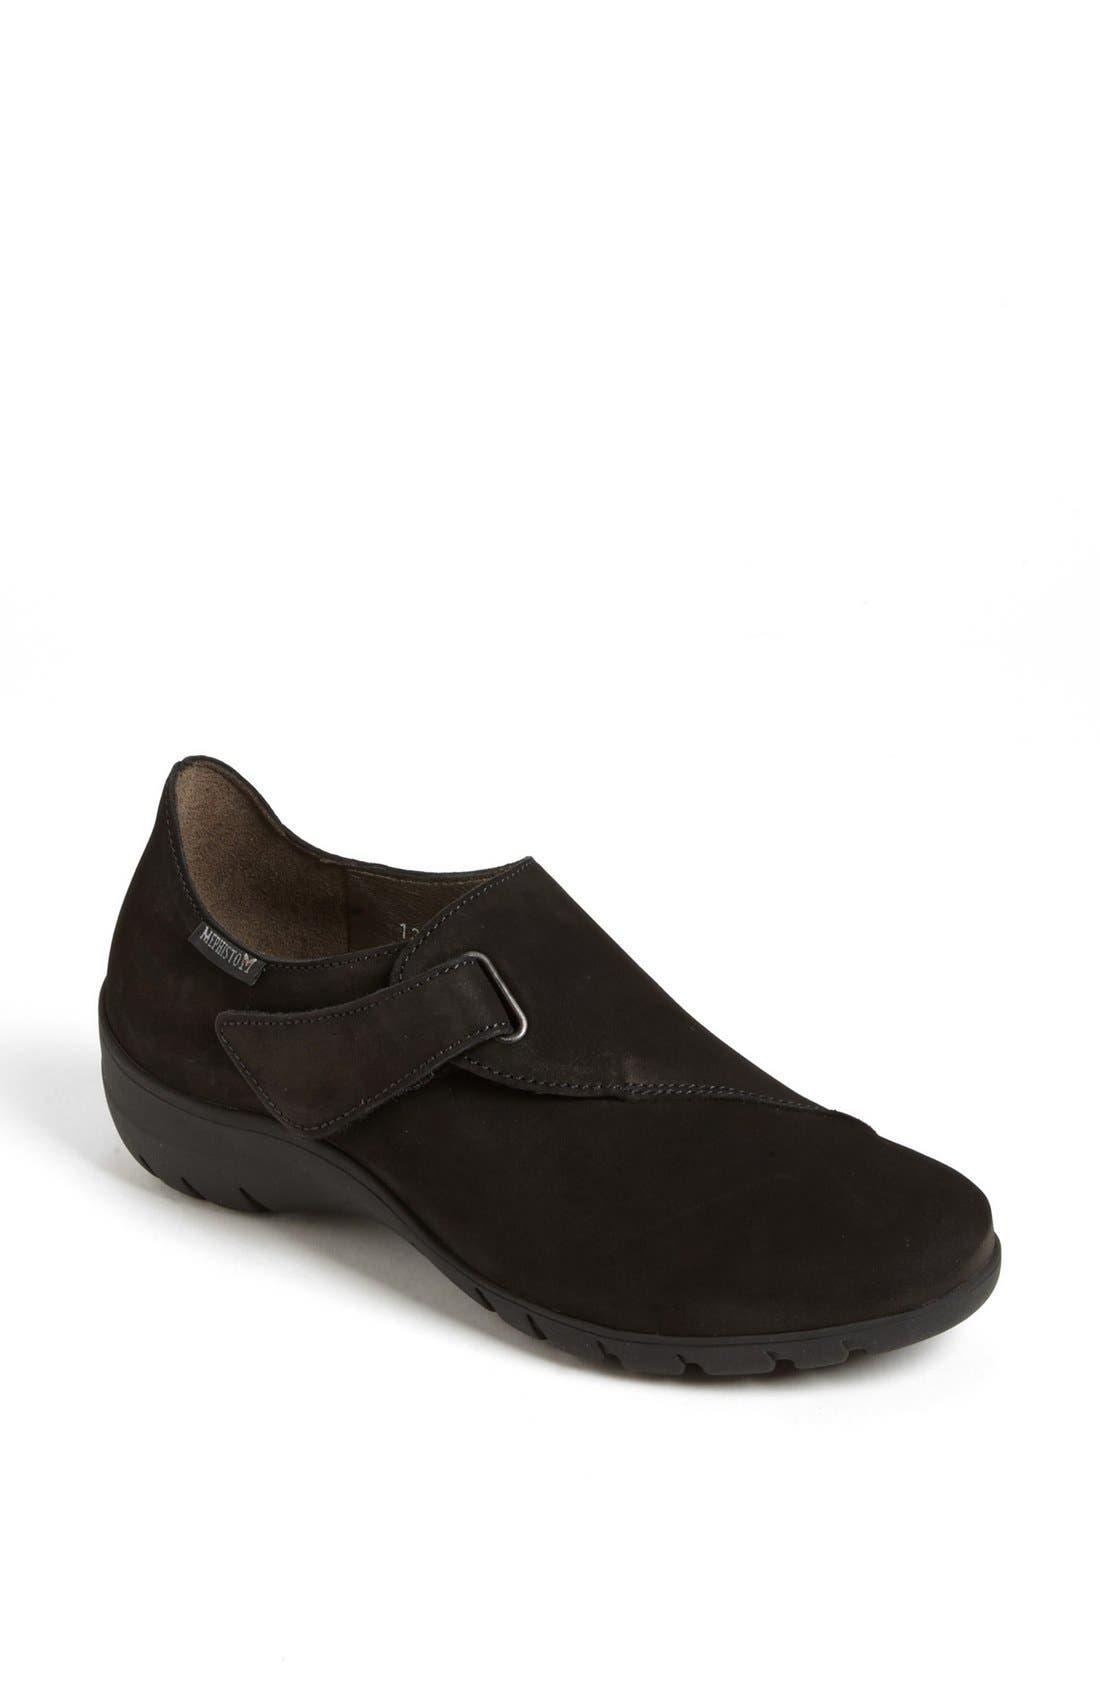 MEPHISTO 'Luce' Sneaker, Main, color, BLACK BUCKSOFT